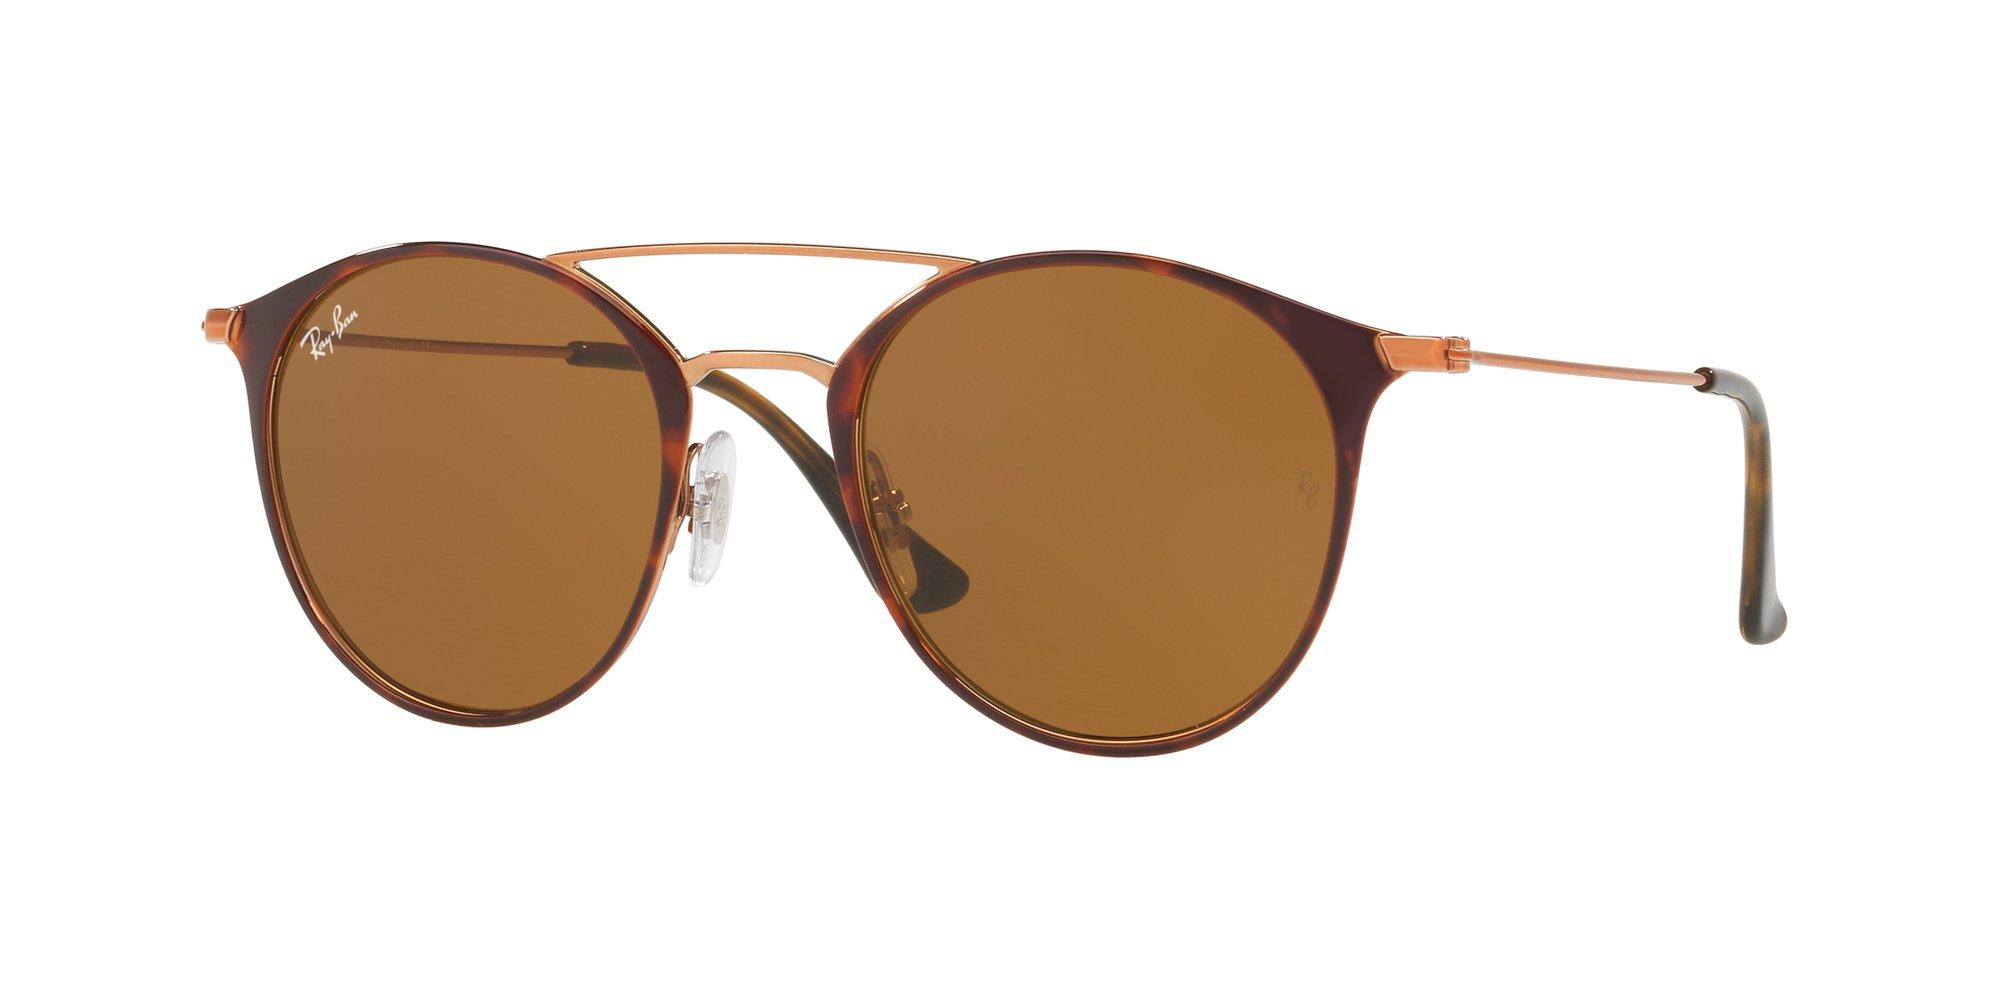 Ray-Ban Steel Unisex Round Sunglasses, Copper on Top Havana, 49 mm